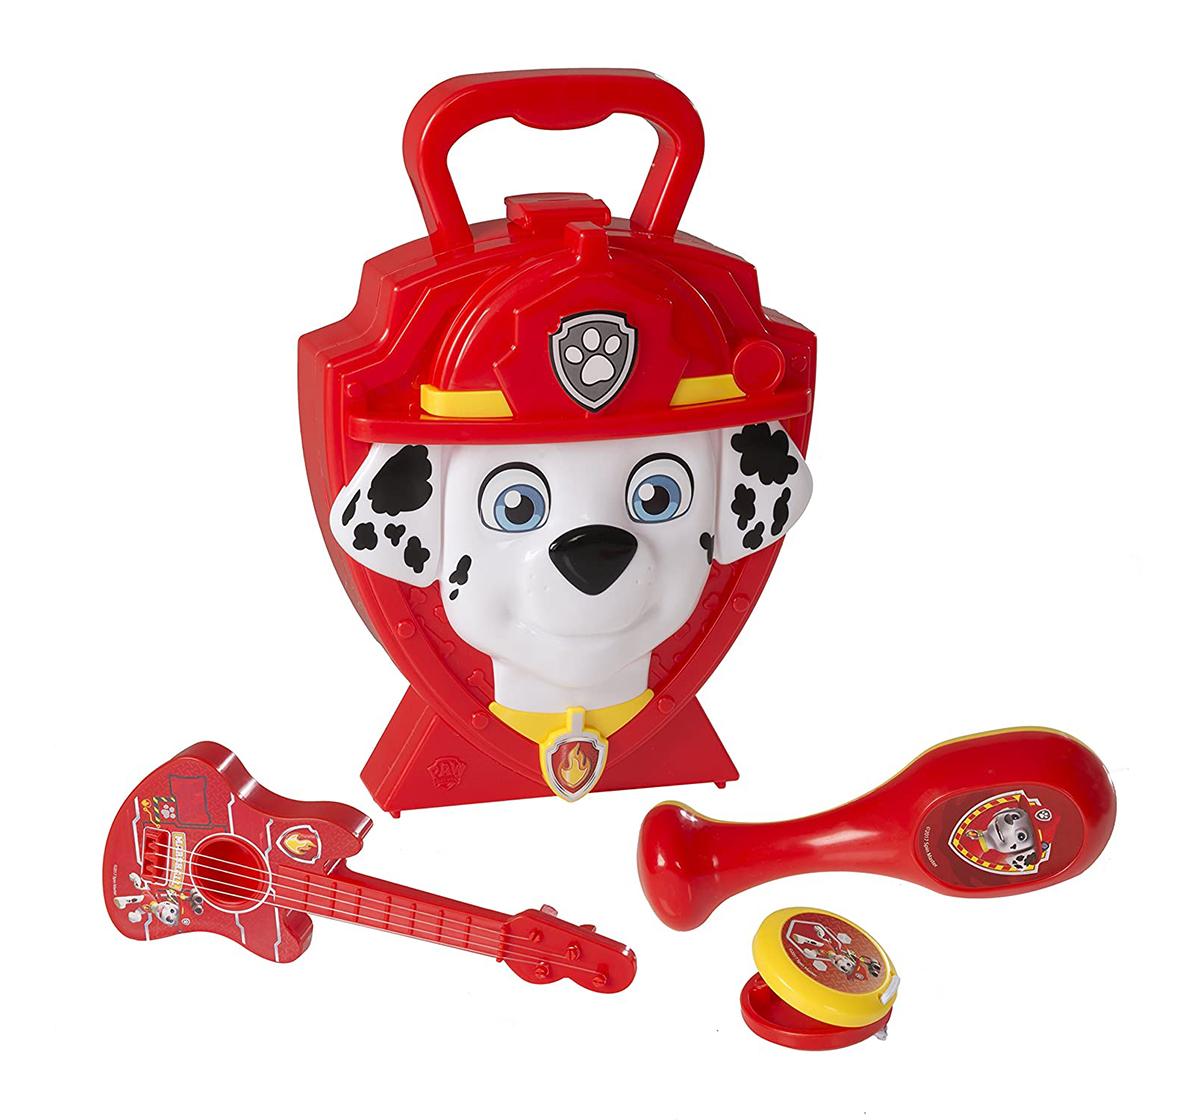 Paw Patrol   Paw Patrol Marshall Case Impulse Toys for Boys age 3Y+